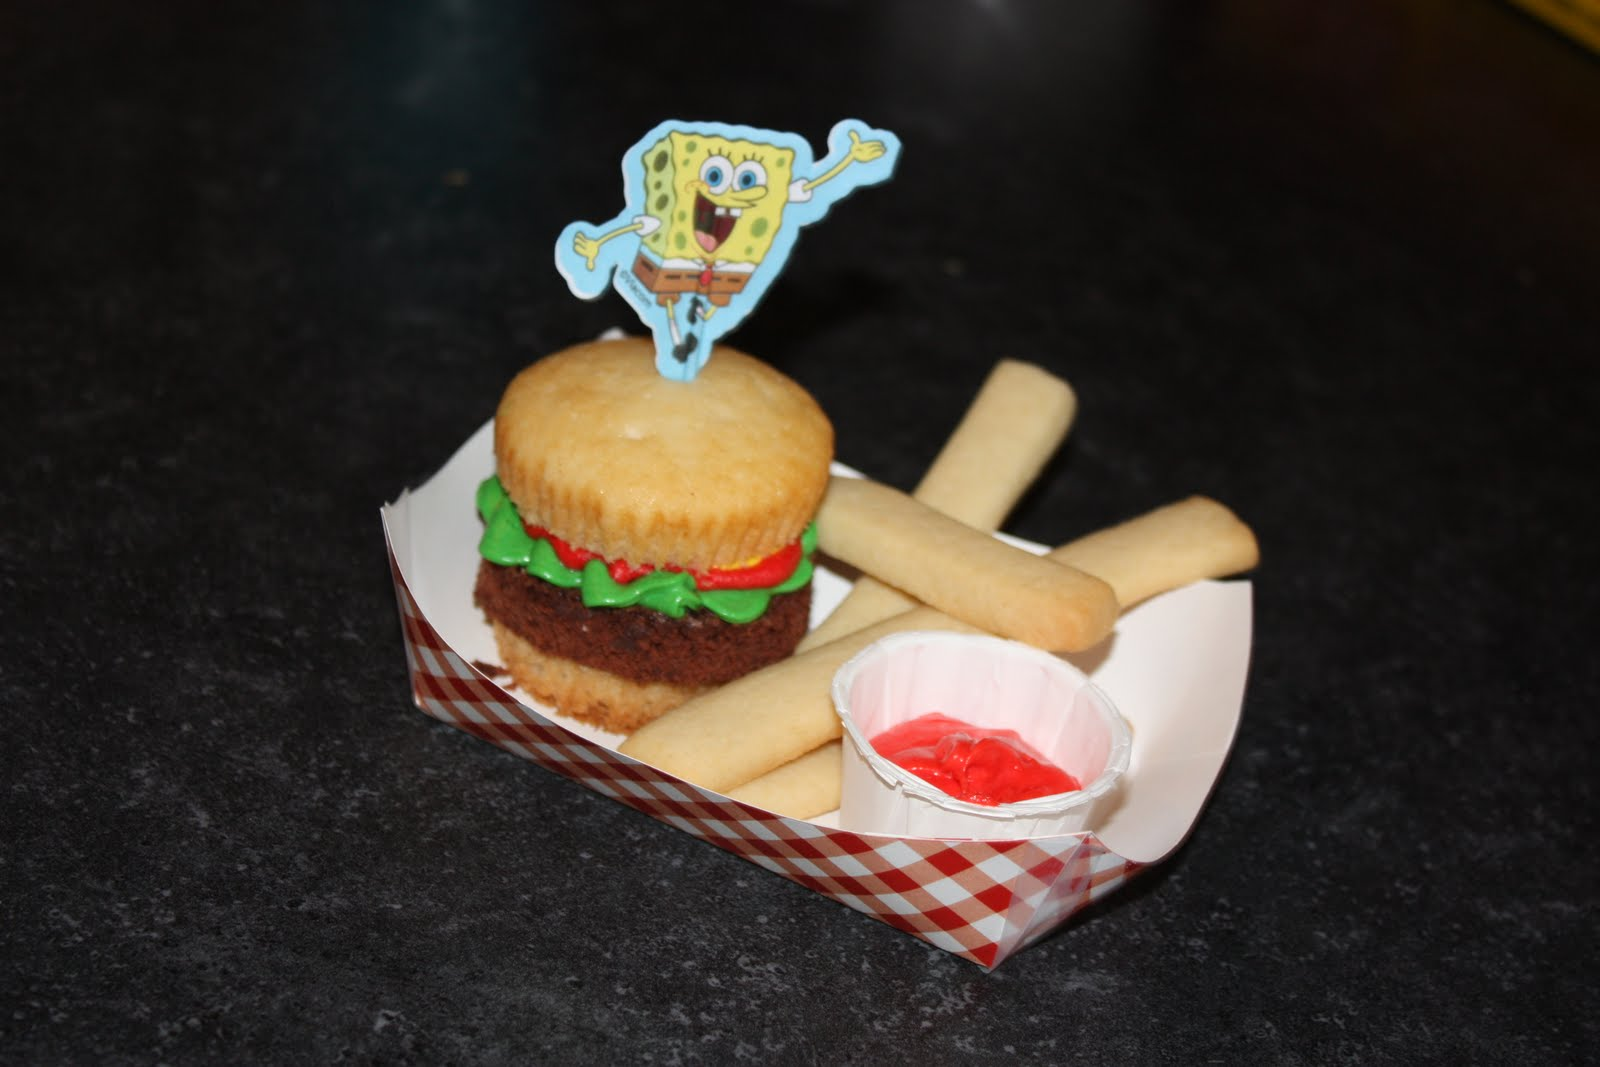 My Ava Cakes Spongebob Krabby Patty And Fries Happy Birthday Jared